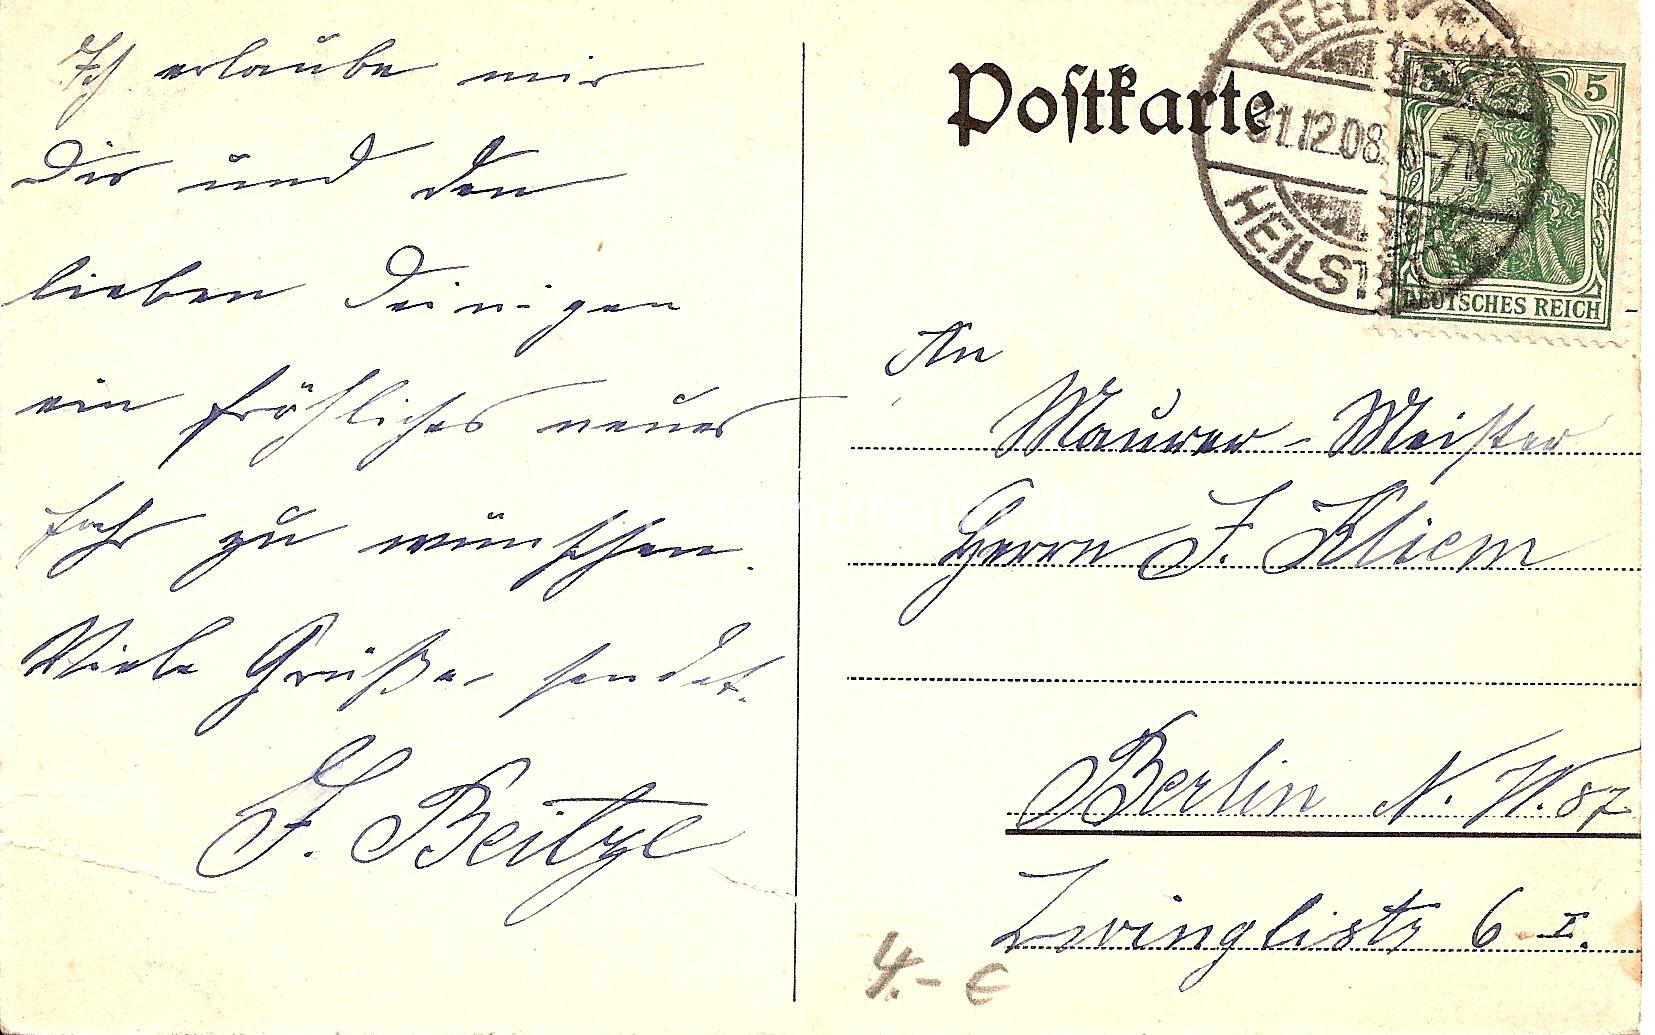 1908 12 31